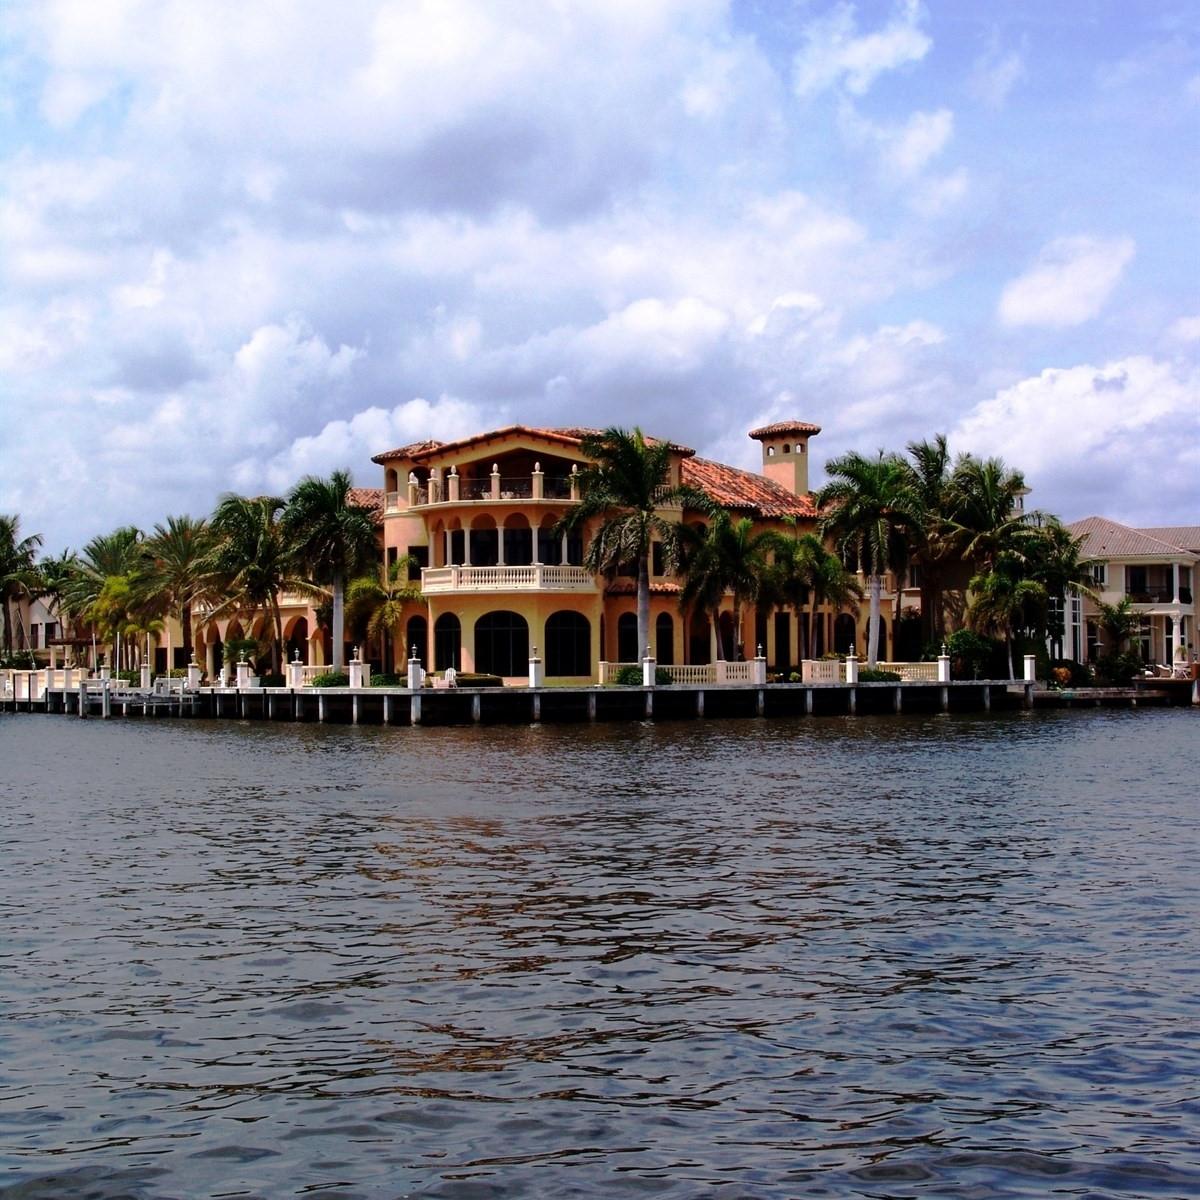 luxury_mansion_waterfront_beachside_florida_architecture_european_real_estate